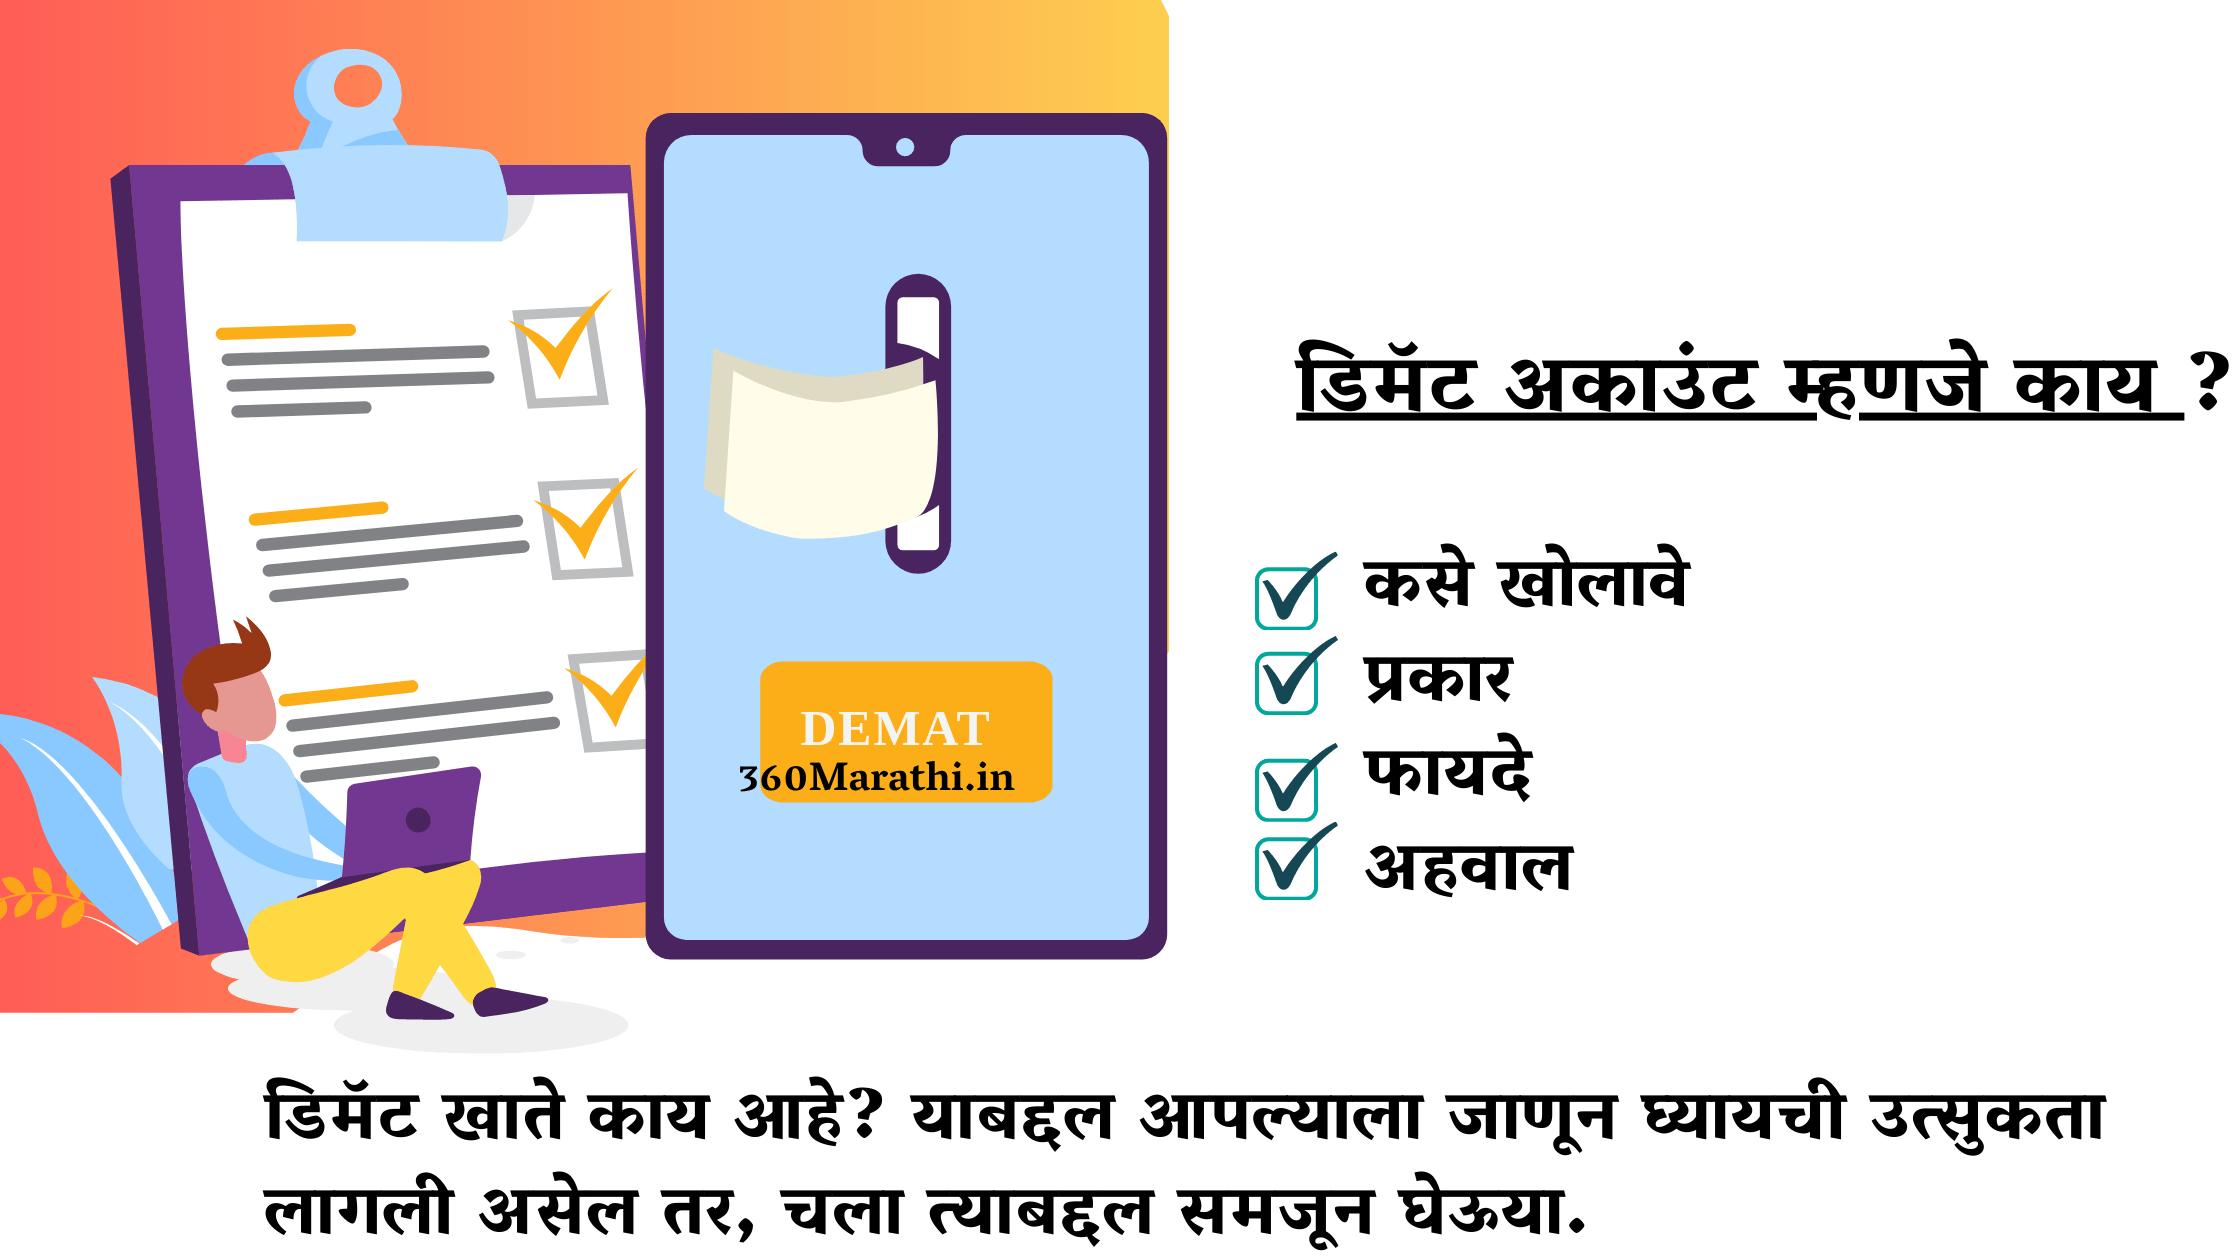 डिमॅट अकाउंट म्हणजे काय, कसे खोलावे, प्रकार, फायदे, अहवाल In Marathi | Demat Account all Information in Marathi